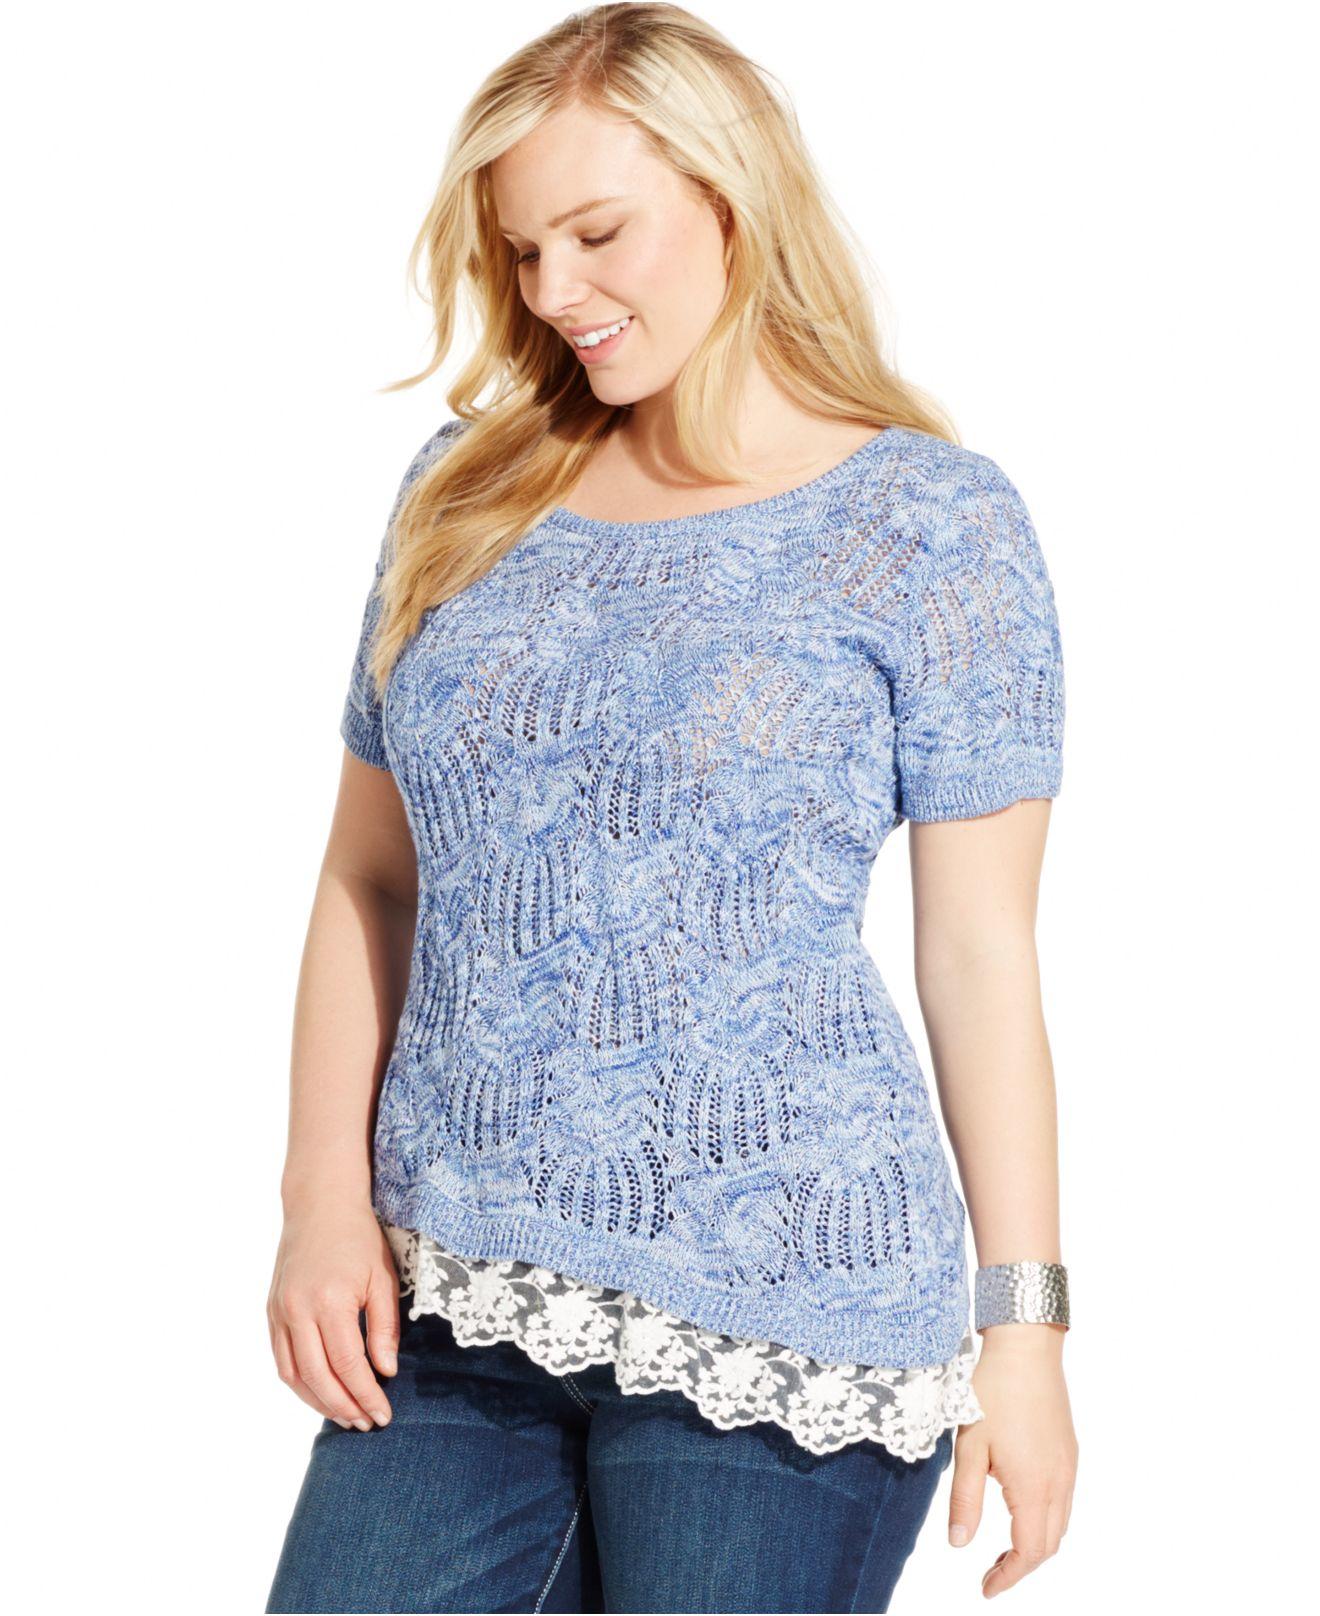 65989340ddd45 Lyst - INC International Concepts Plus Size Lace-hem Open-knit Top ...